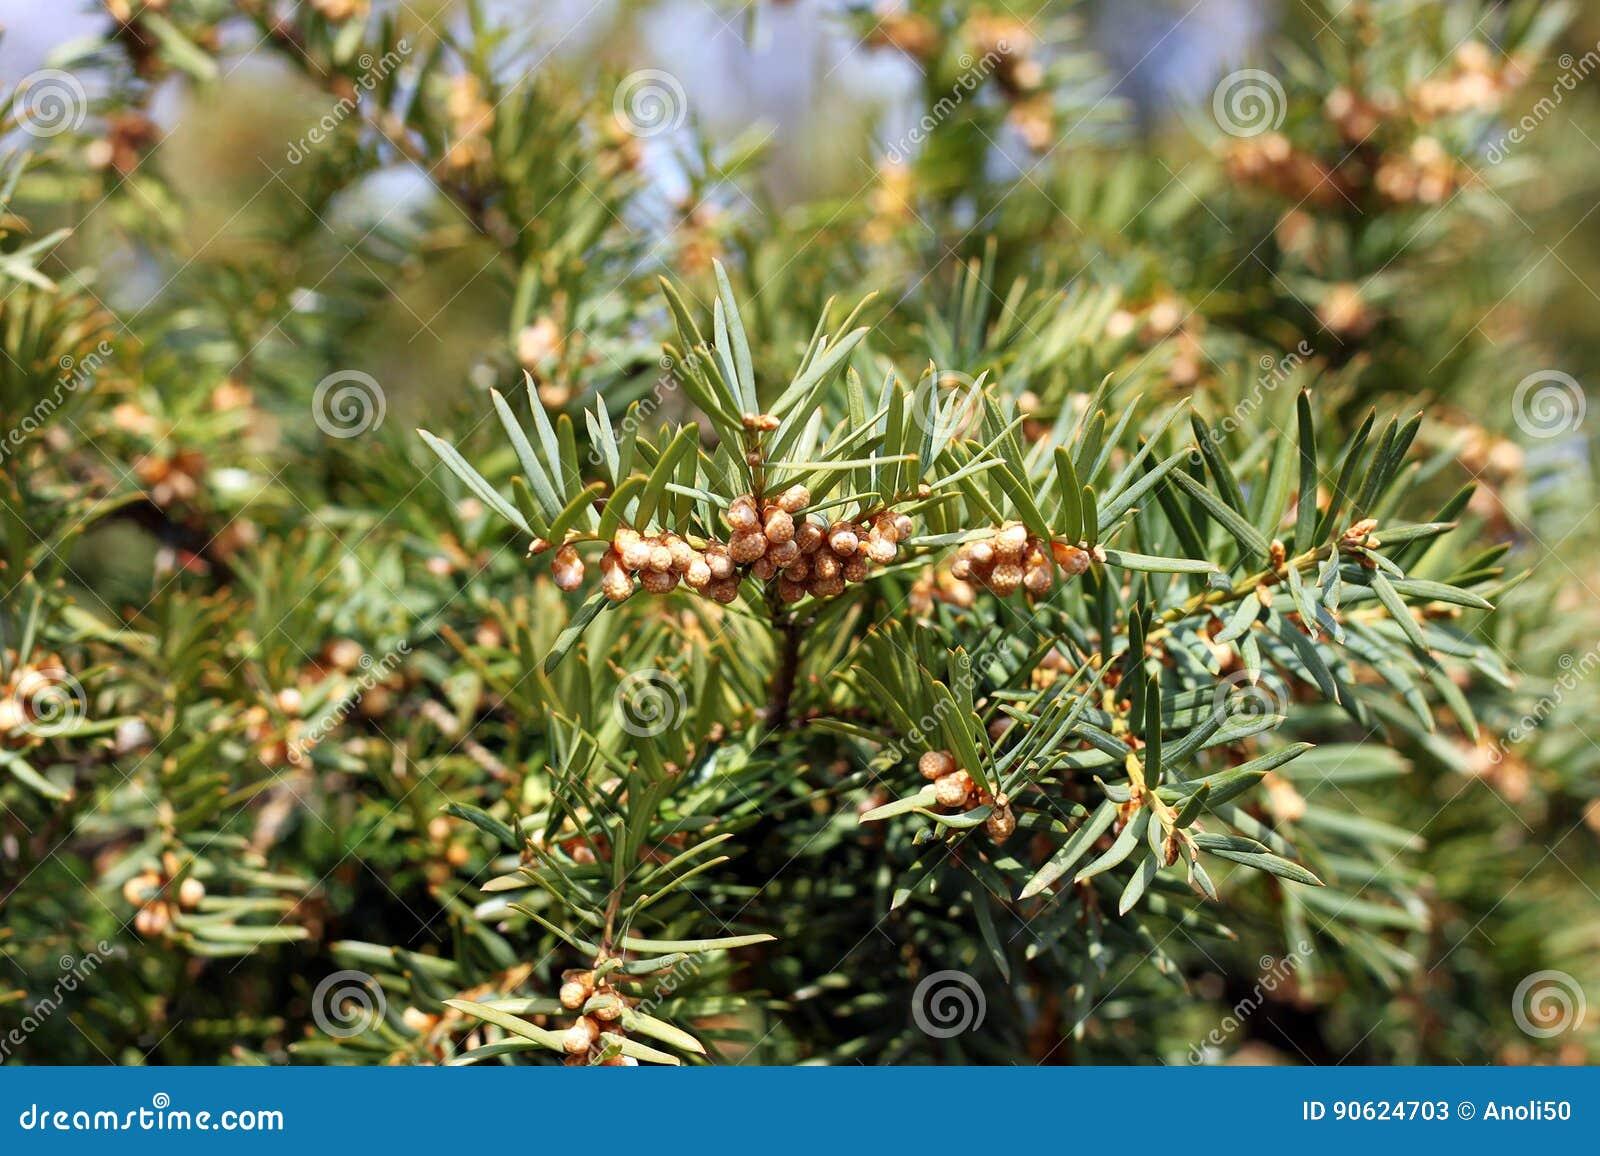 european yew tree in spring stock image image of flora toxic